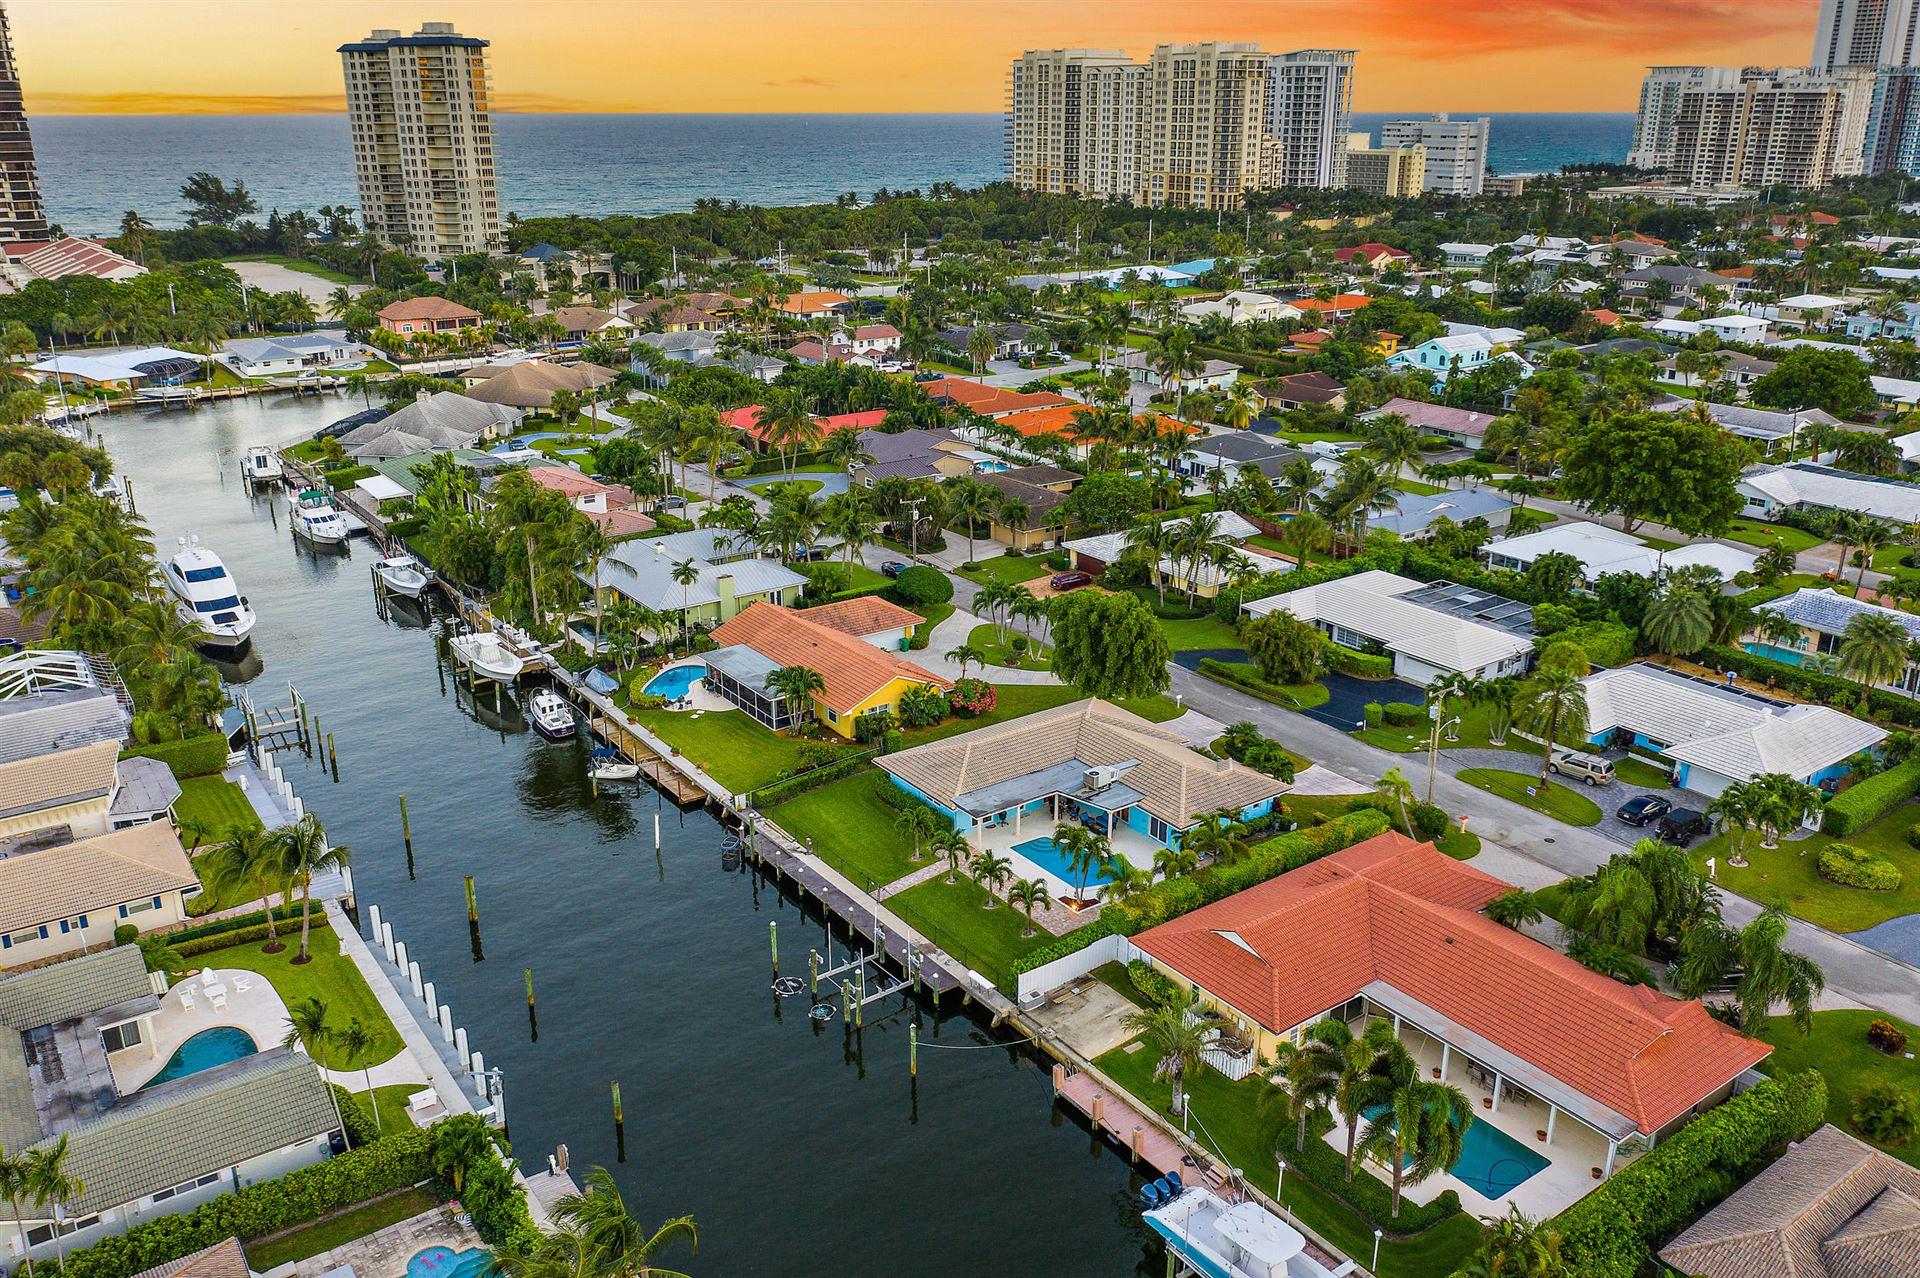 Photo of 1200 Fairview Lane, Singer Island, FL 33404 (MLS # RX-10668594)